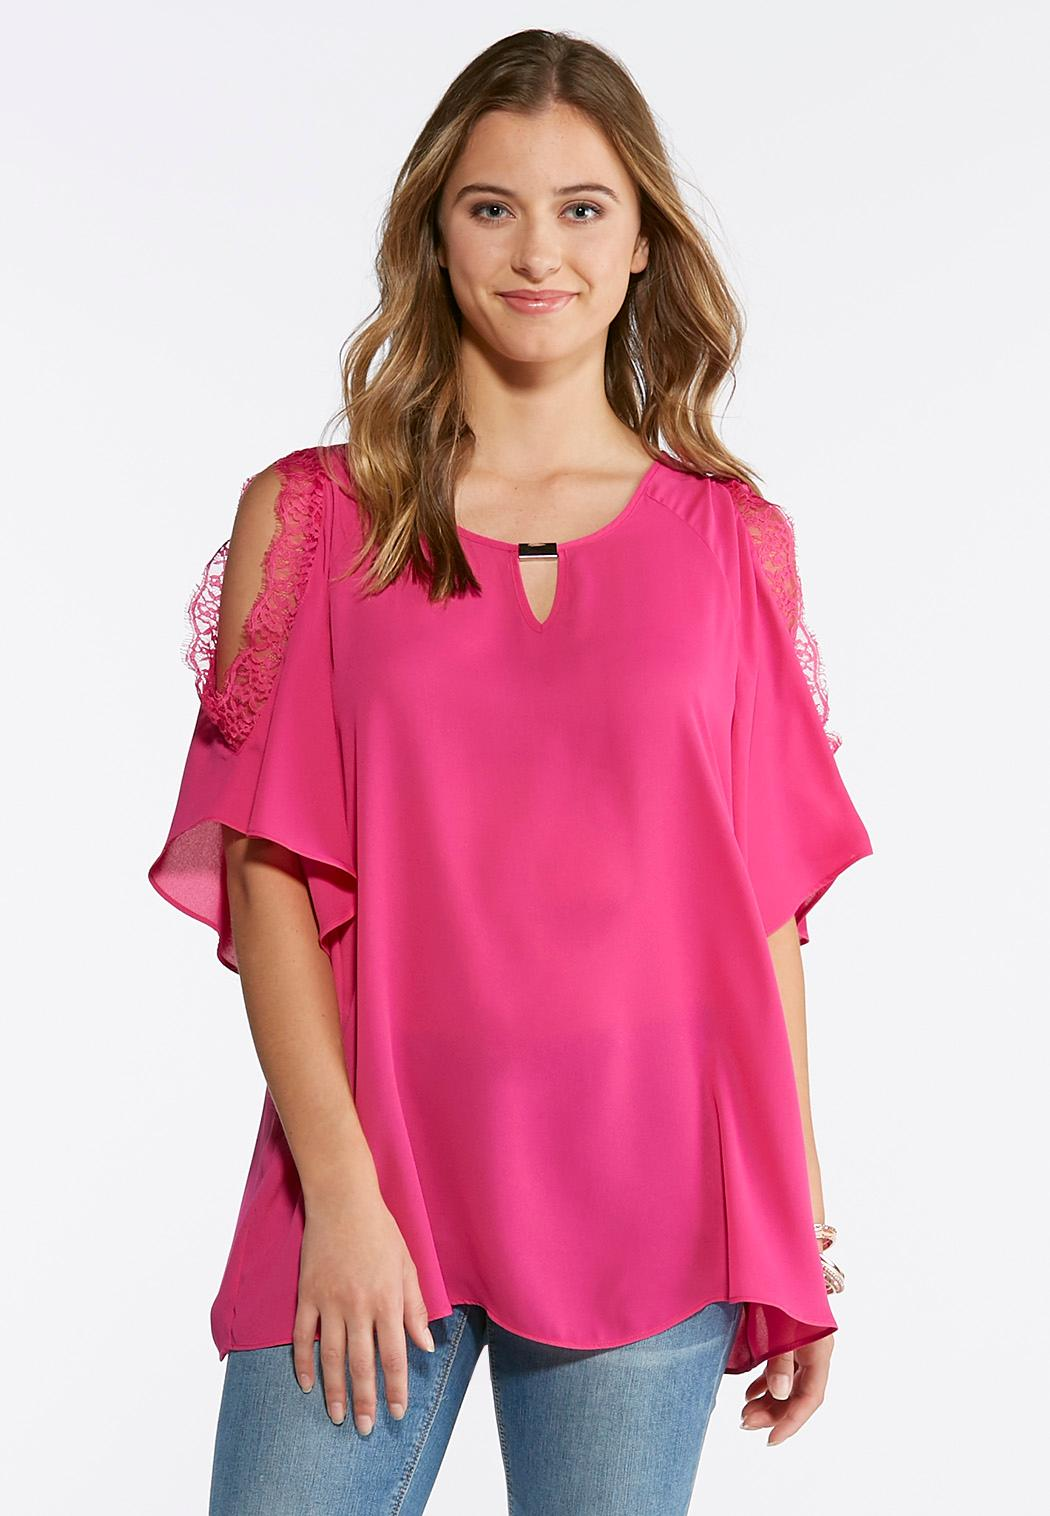 Asombroso Vestidos De Dama En Baton Rouge Regalo - Ideas de Estilos ...